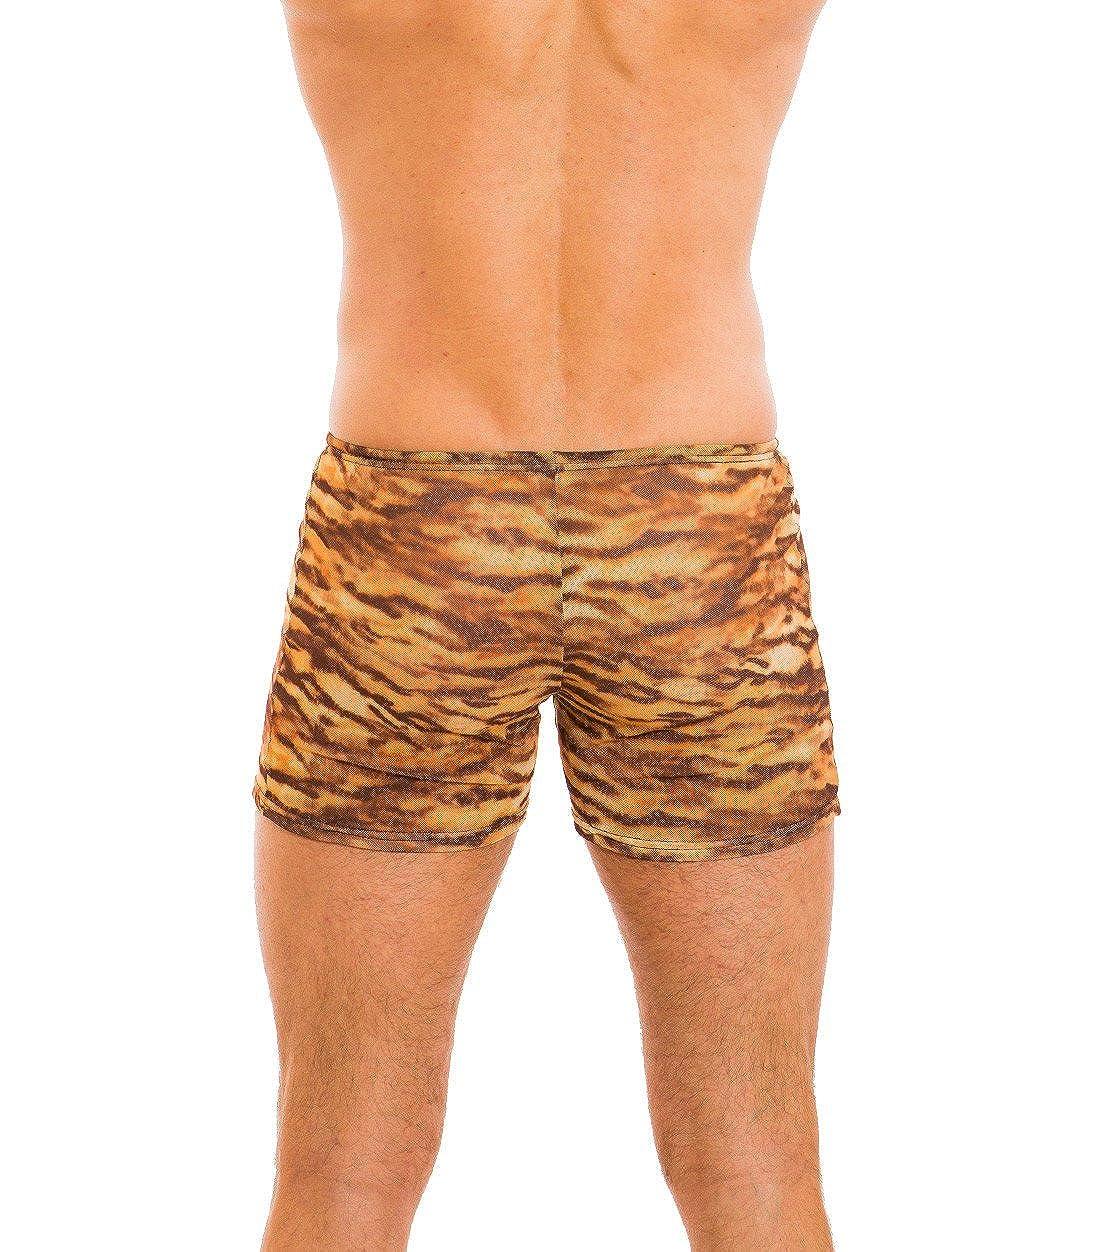 36b8174af8df3 Kiniki Sara Tan Through Swim Shorts Swimwear | Amazon.com